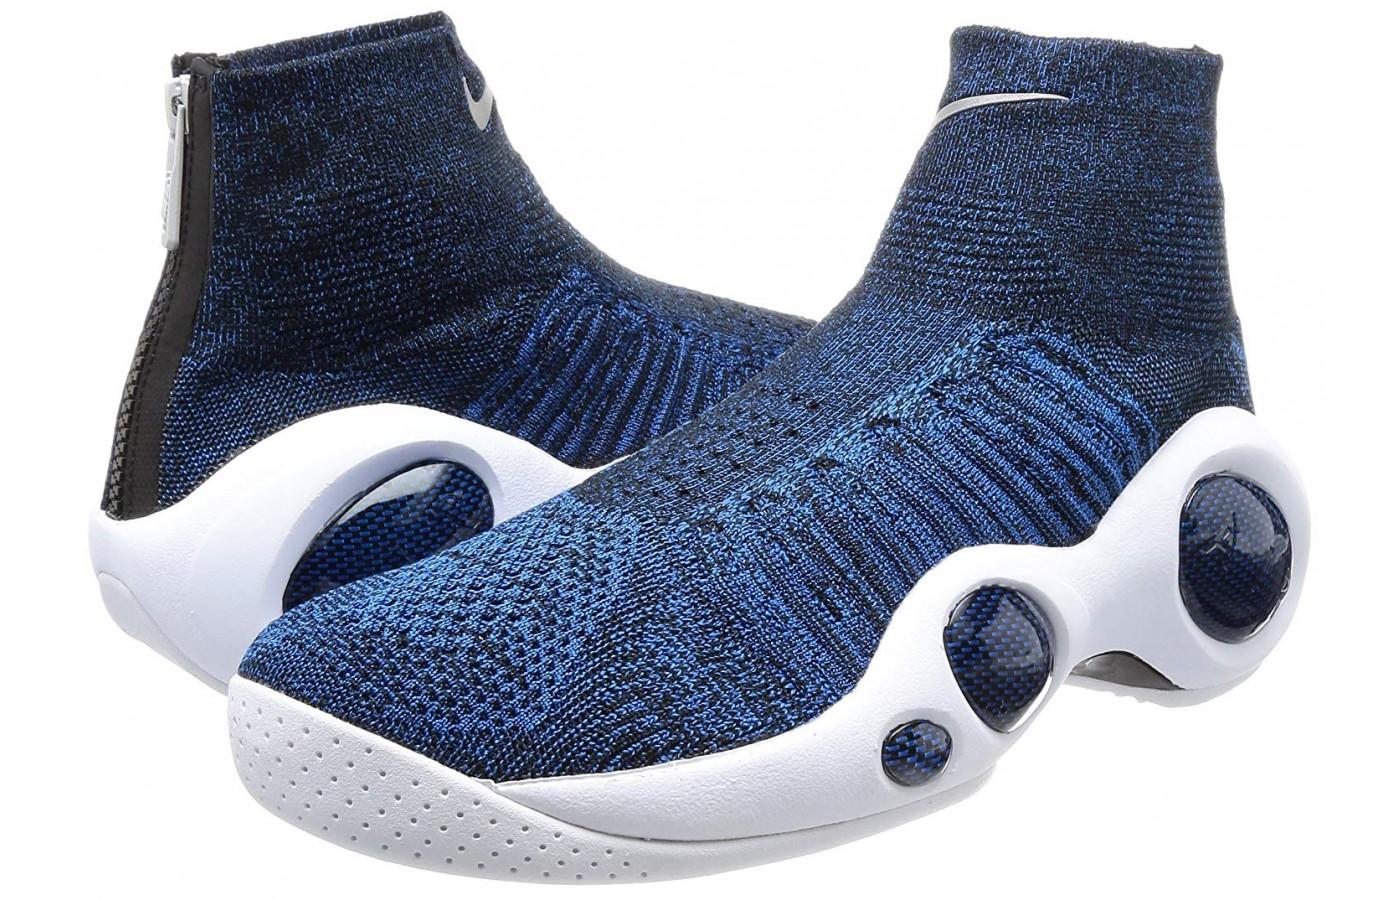 Nike Flight Bonafide pair